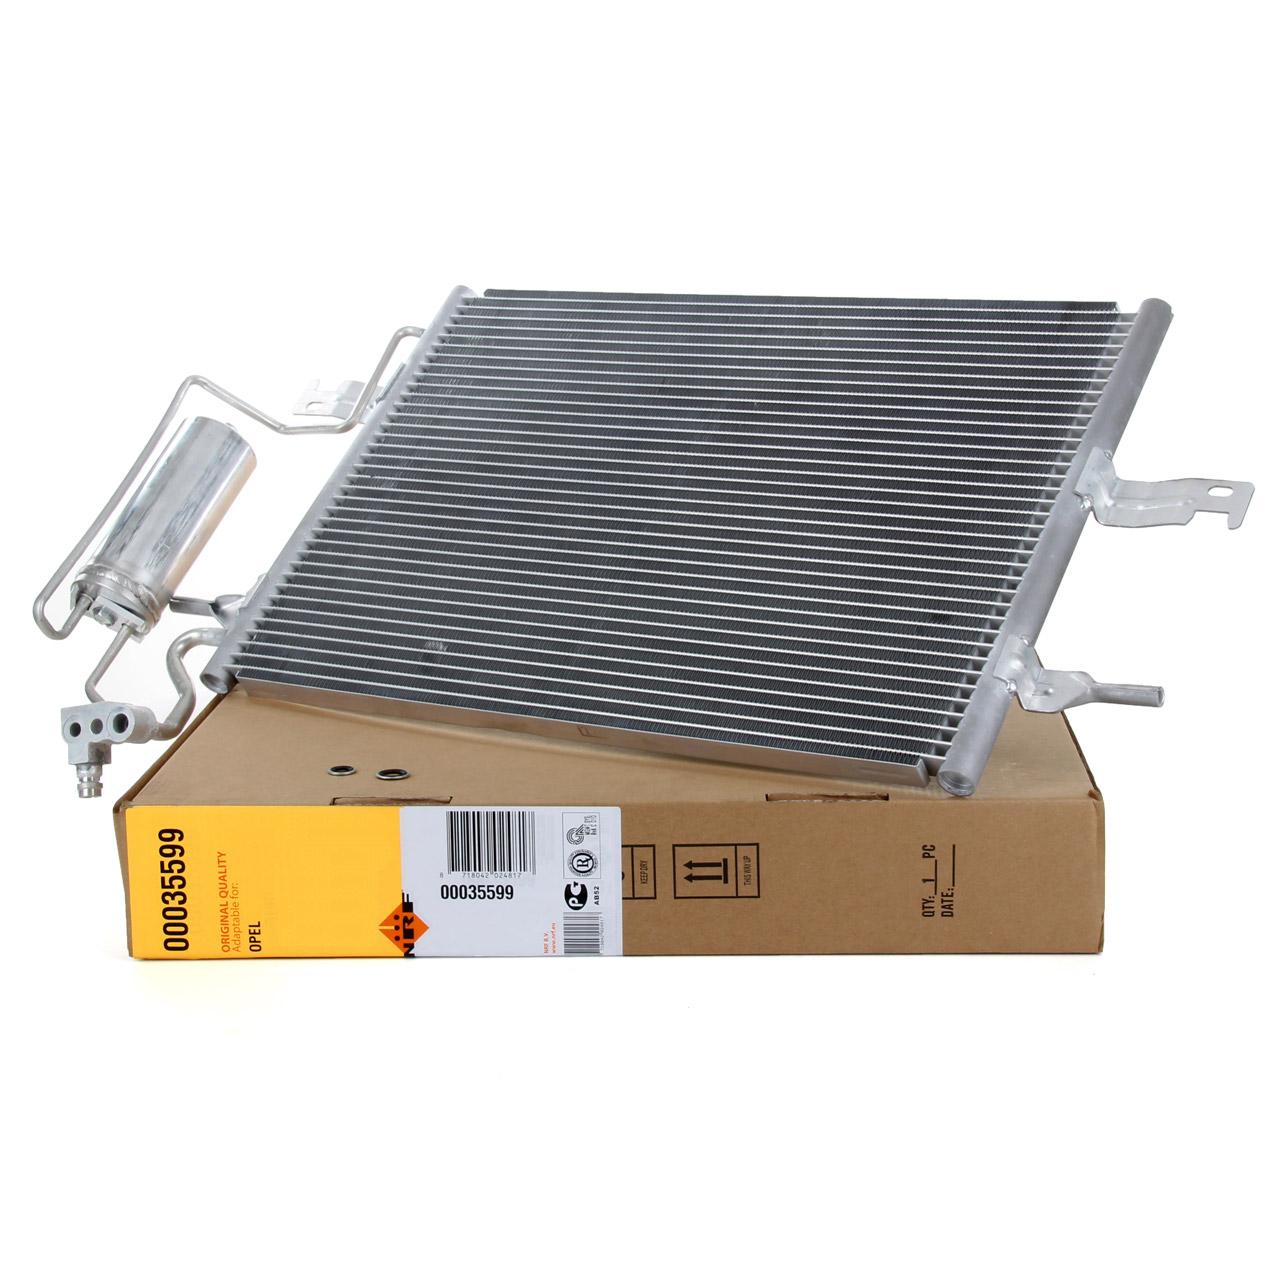 NRF 35599 Kondensator Klimakondensator EASY FIT OPEL Meriva A X03 1.4-1.8 1.7 DTI 13128931